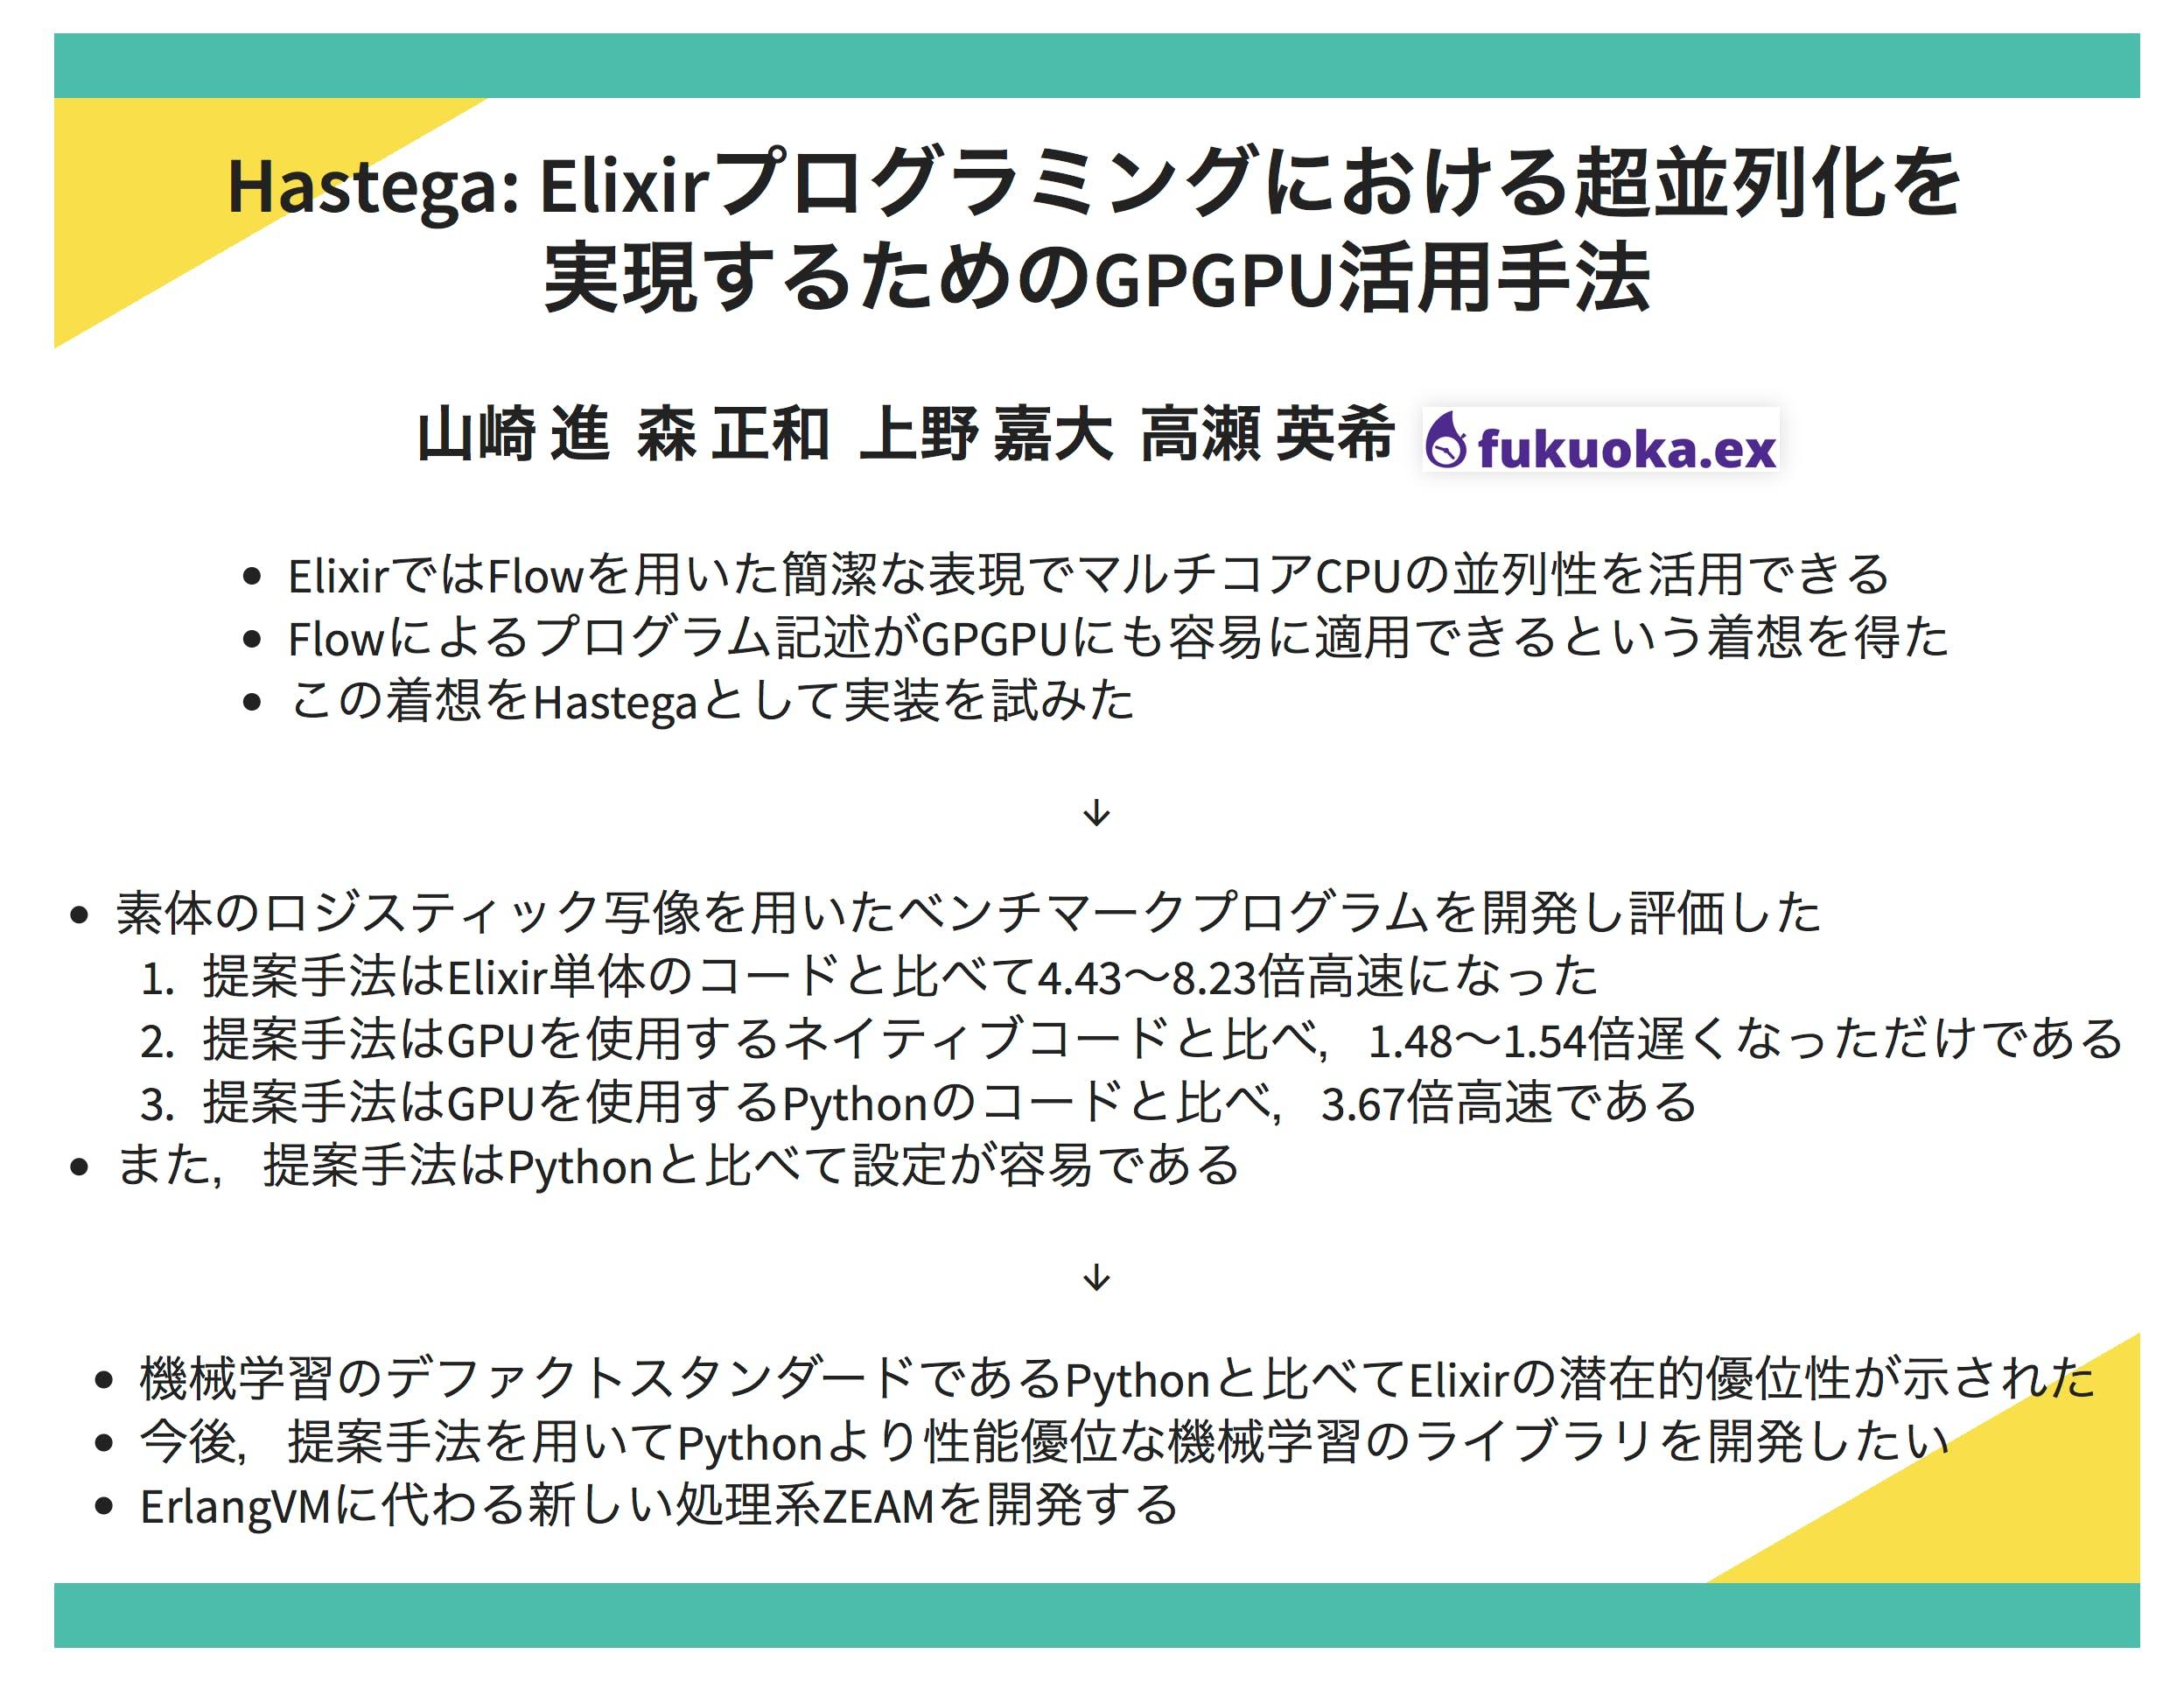 Hastega: Elixirプログラミングにおける超並列化を実現するためのGPGPU活用手法